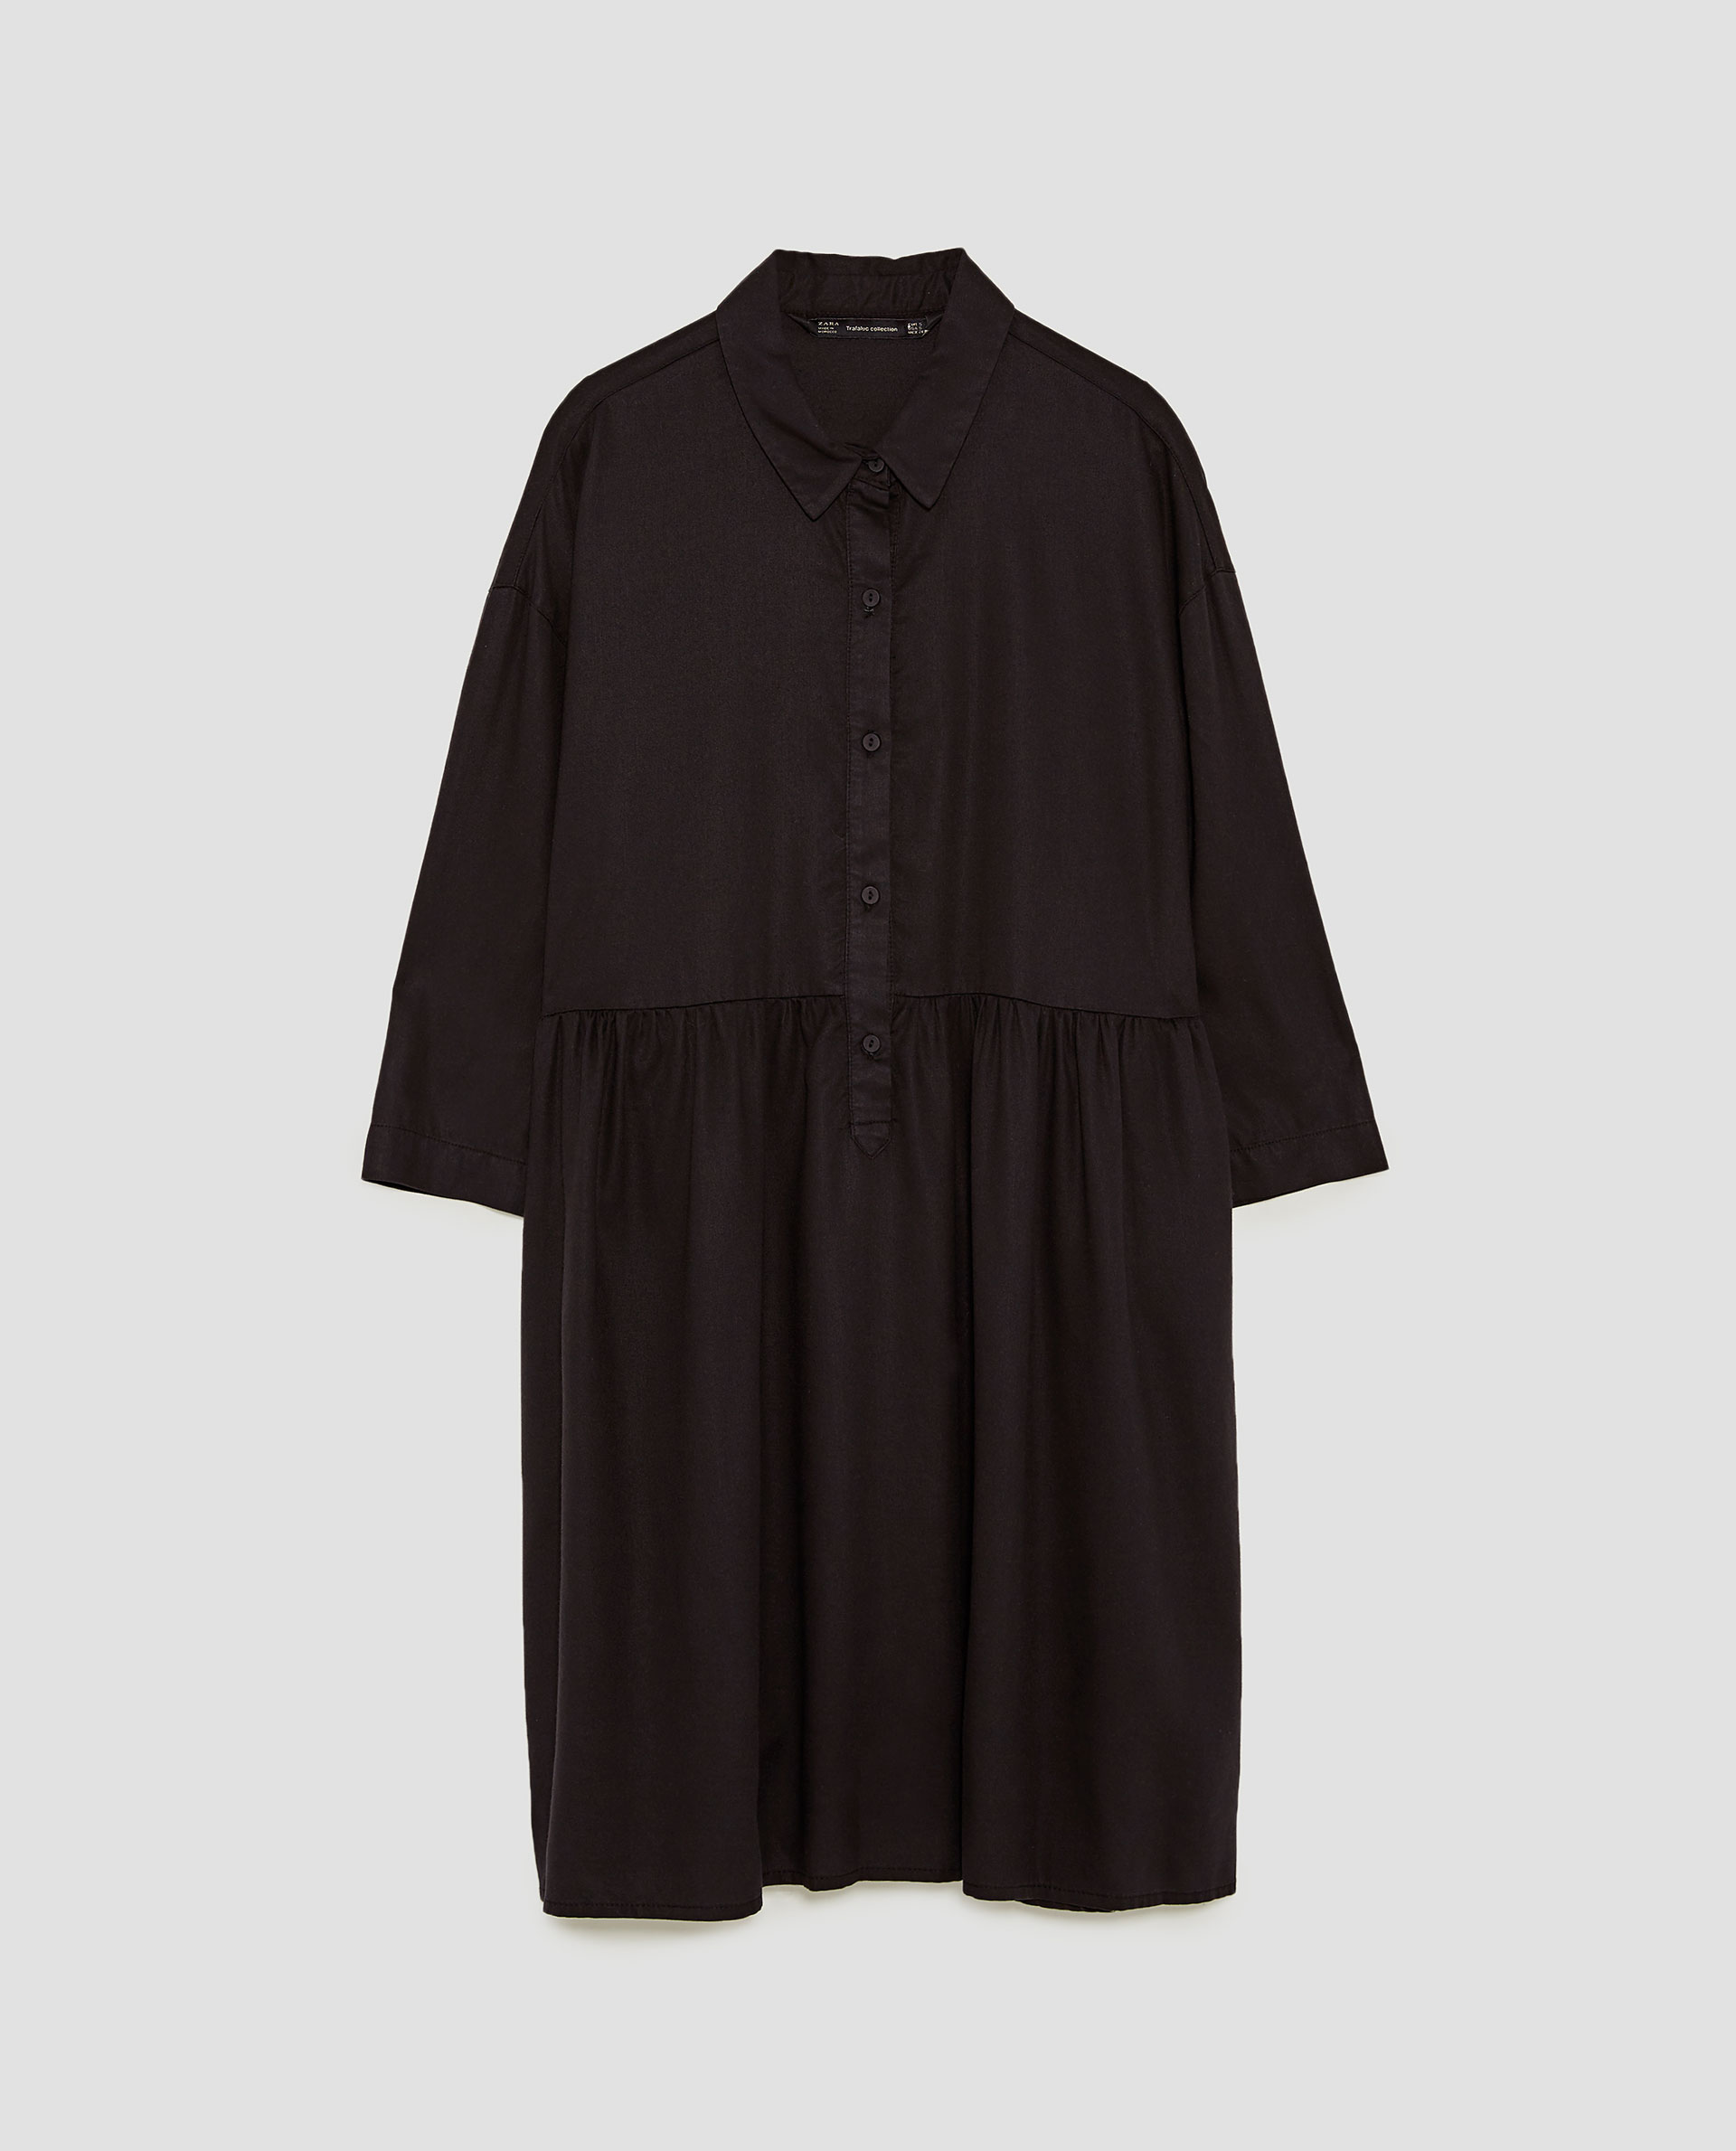 f08114ab Very Goods | RUFFLED SHIRT DRESS - View all-DRESSES-WOMAN | ZARA ...